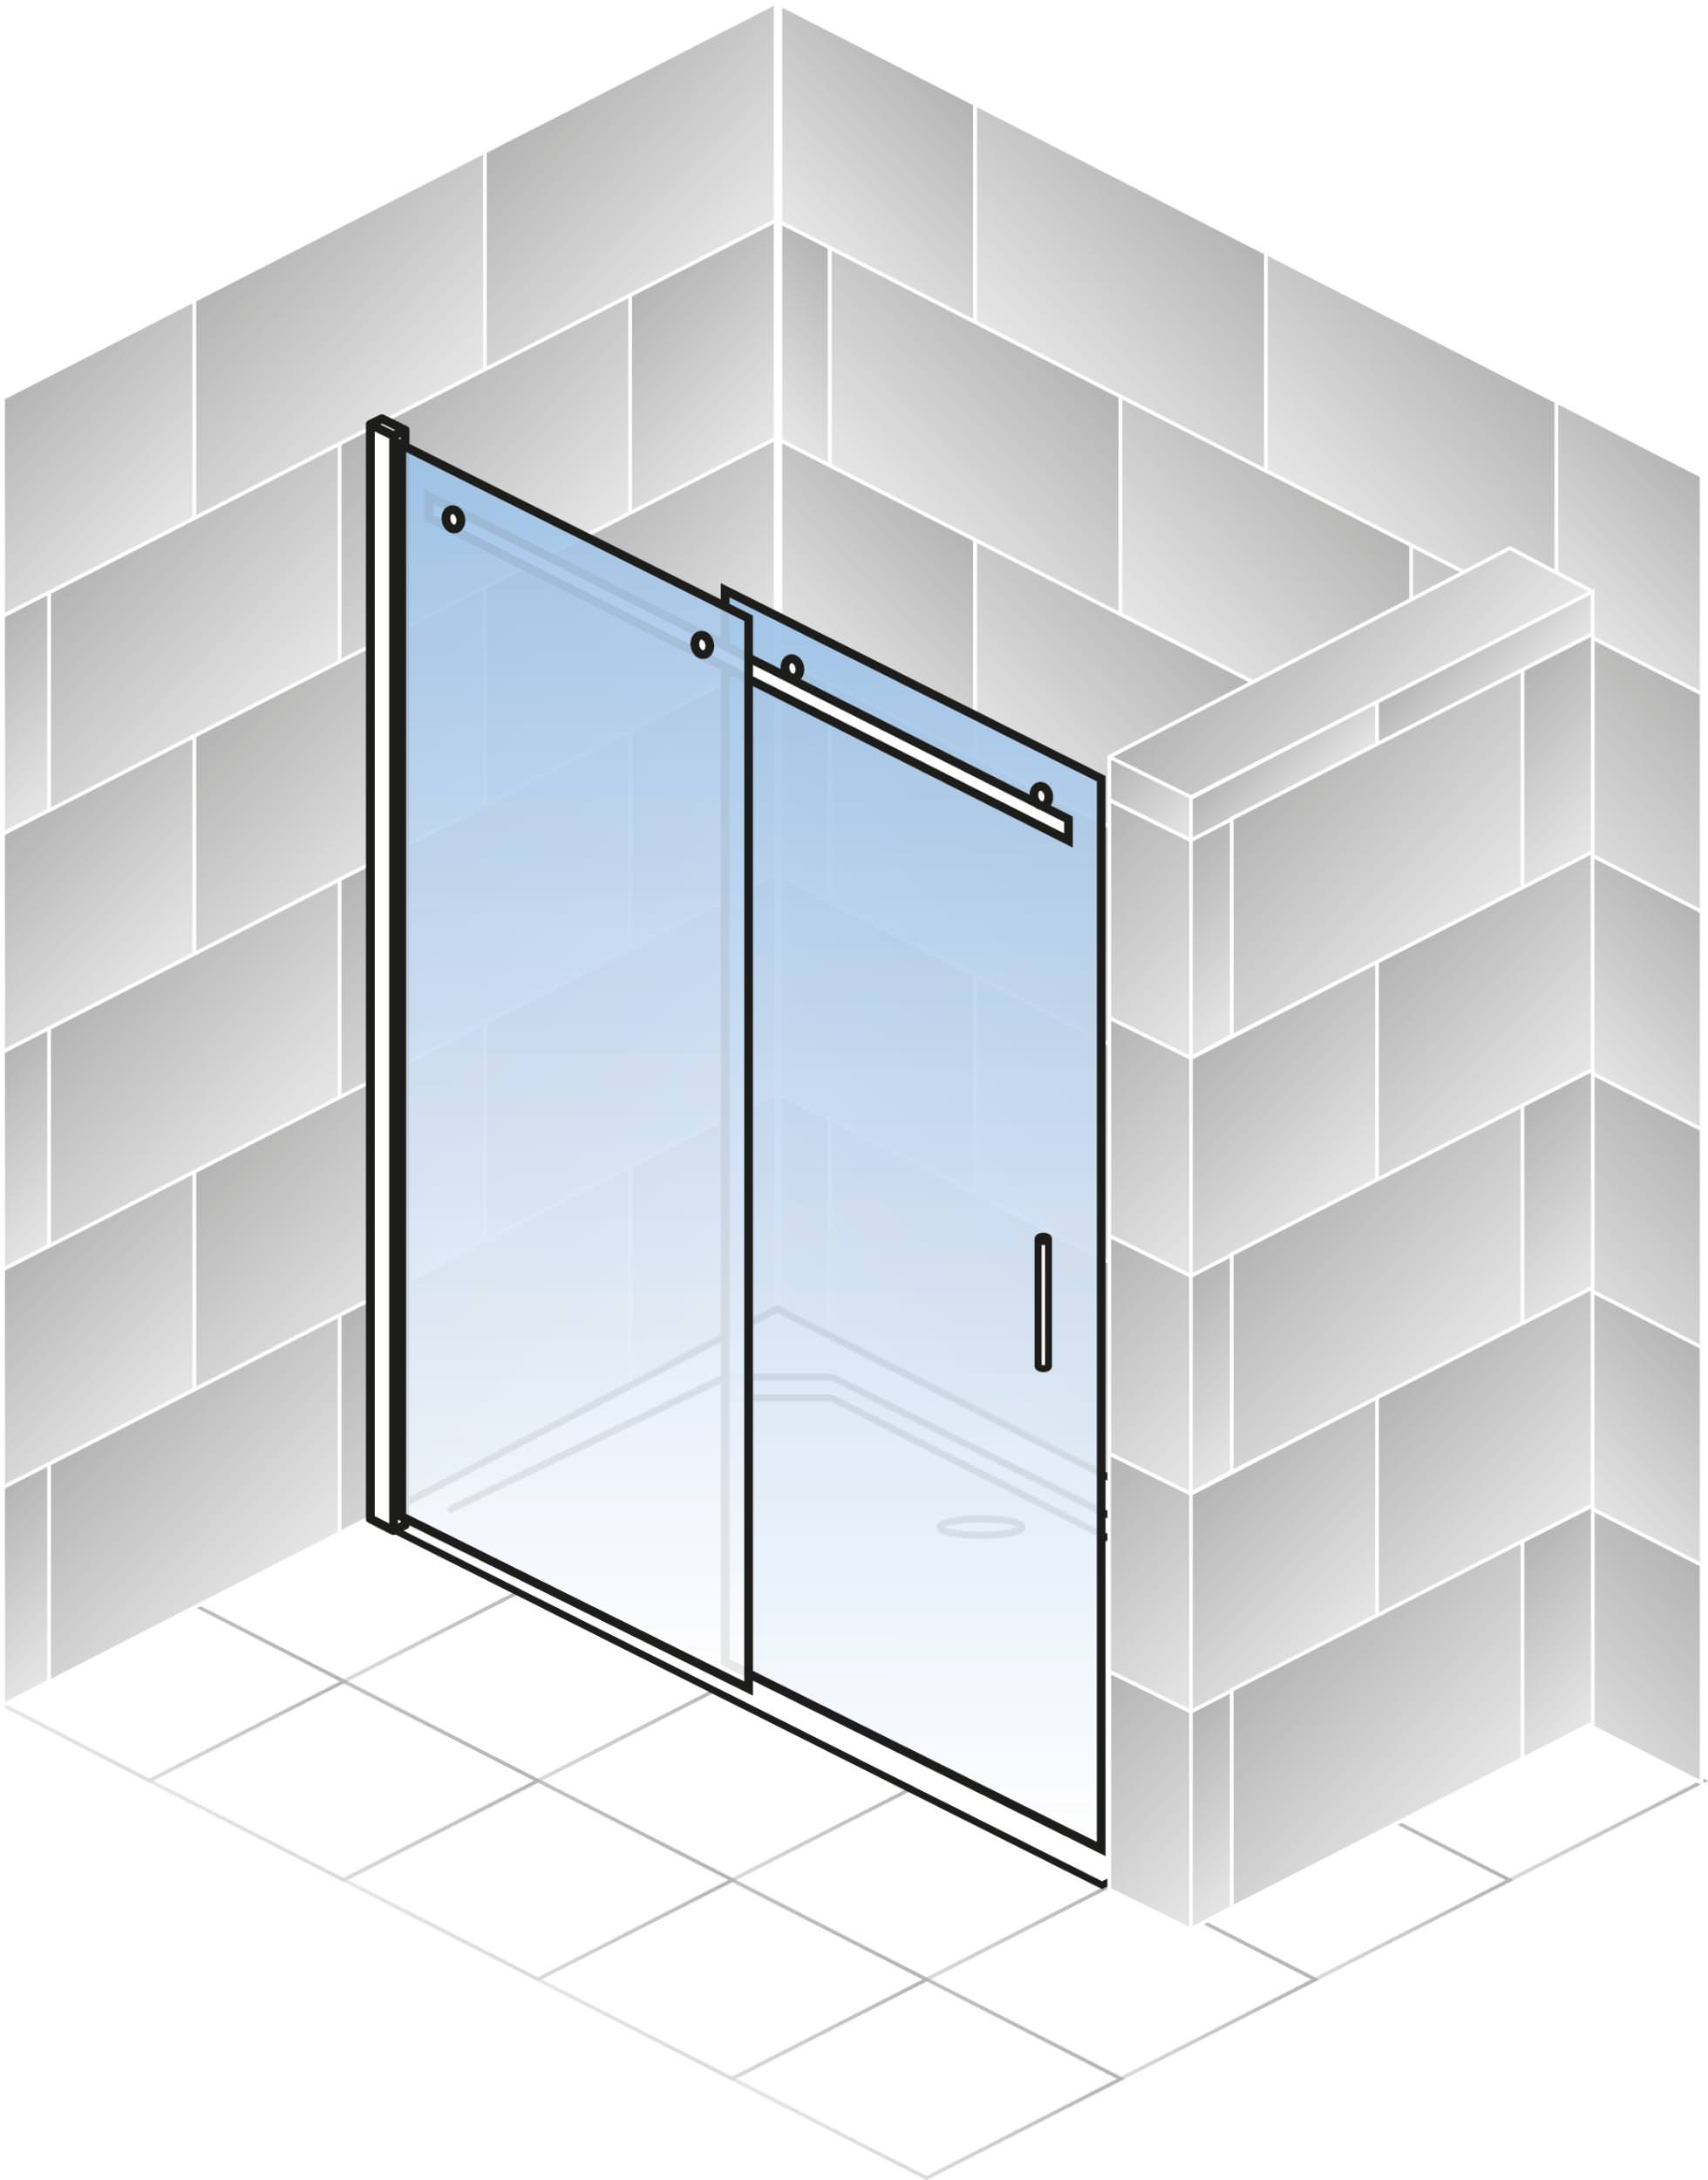 schulte alexa style 2 0 gleitt r f r nische klarglas hell chromoptik sonderma anschlag links. Black Bedroom Furniture Sets. Home Design Ideas